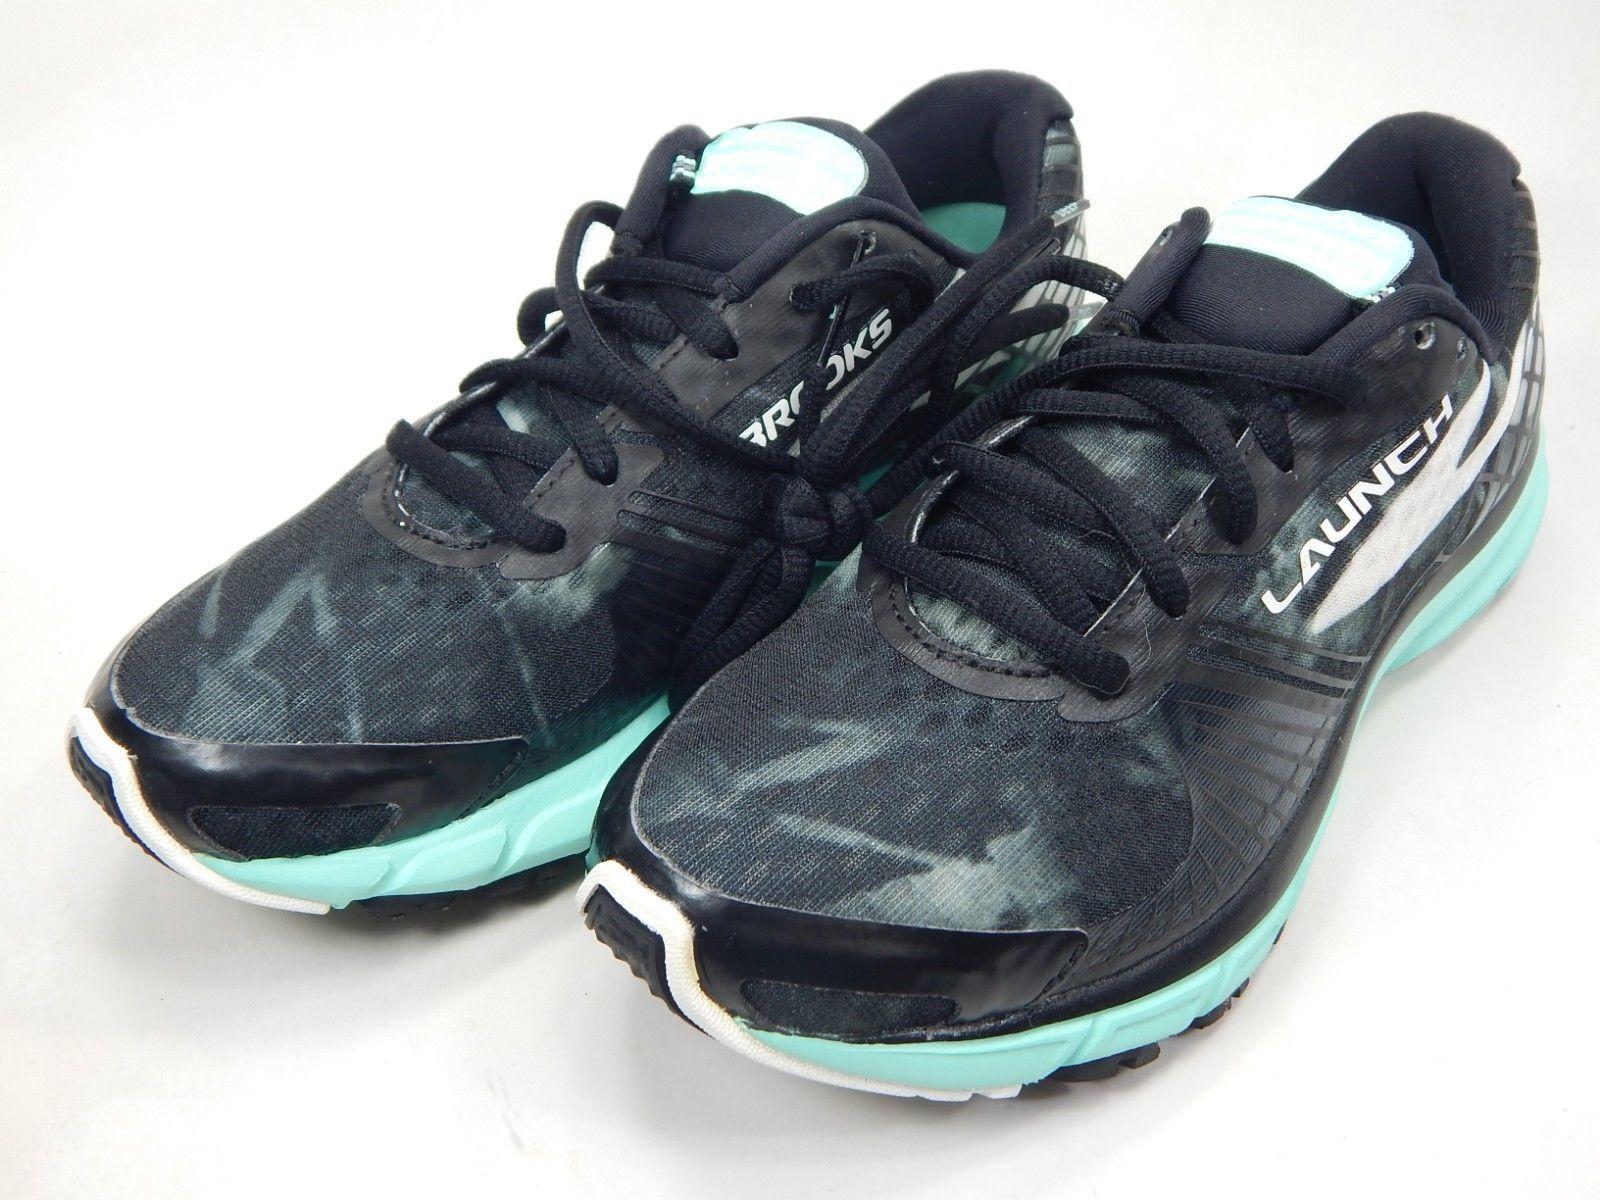 Brooks Launch 3 Size 6.5 M (B) EU 37.5 Women's Running Shoes Black 1202061B071 image 3